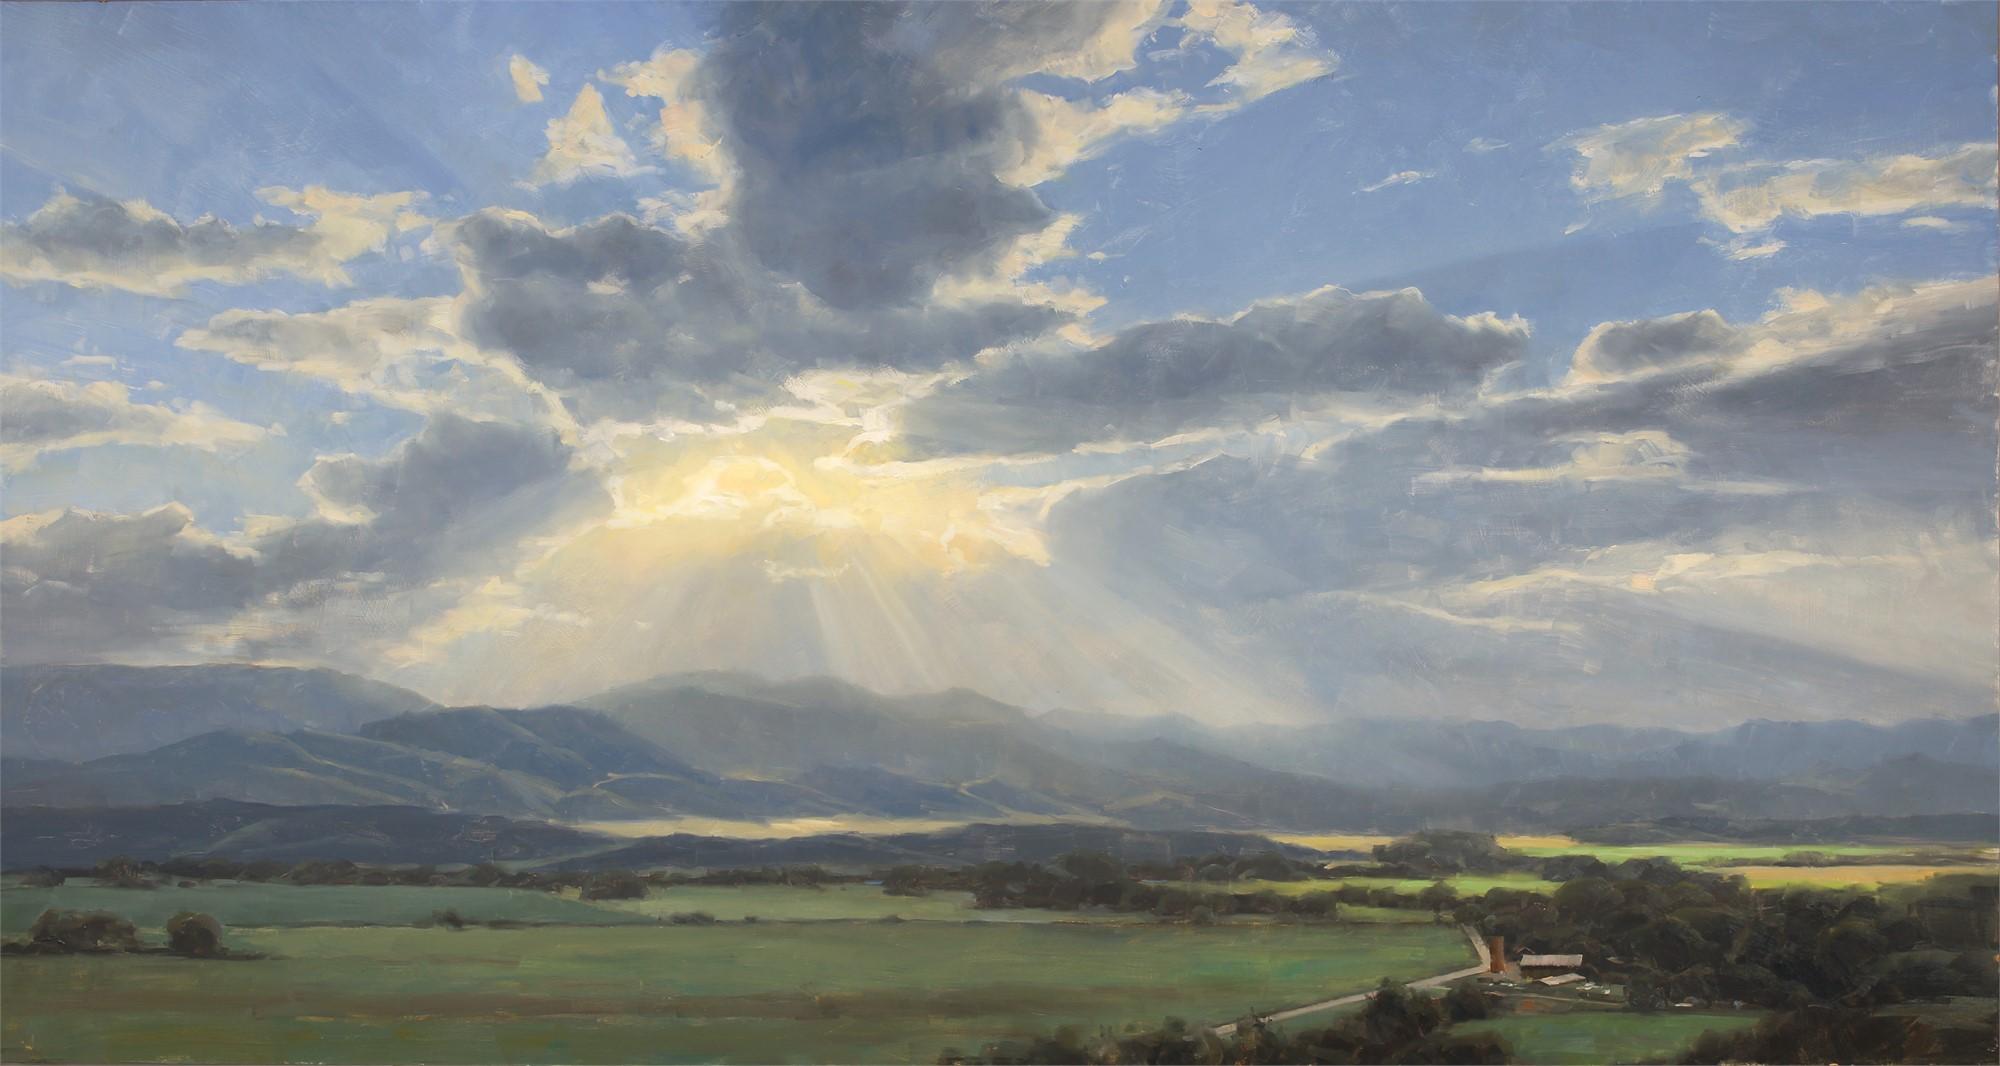 The Pleasant Valley by Dave Santillanes